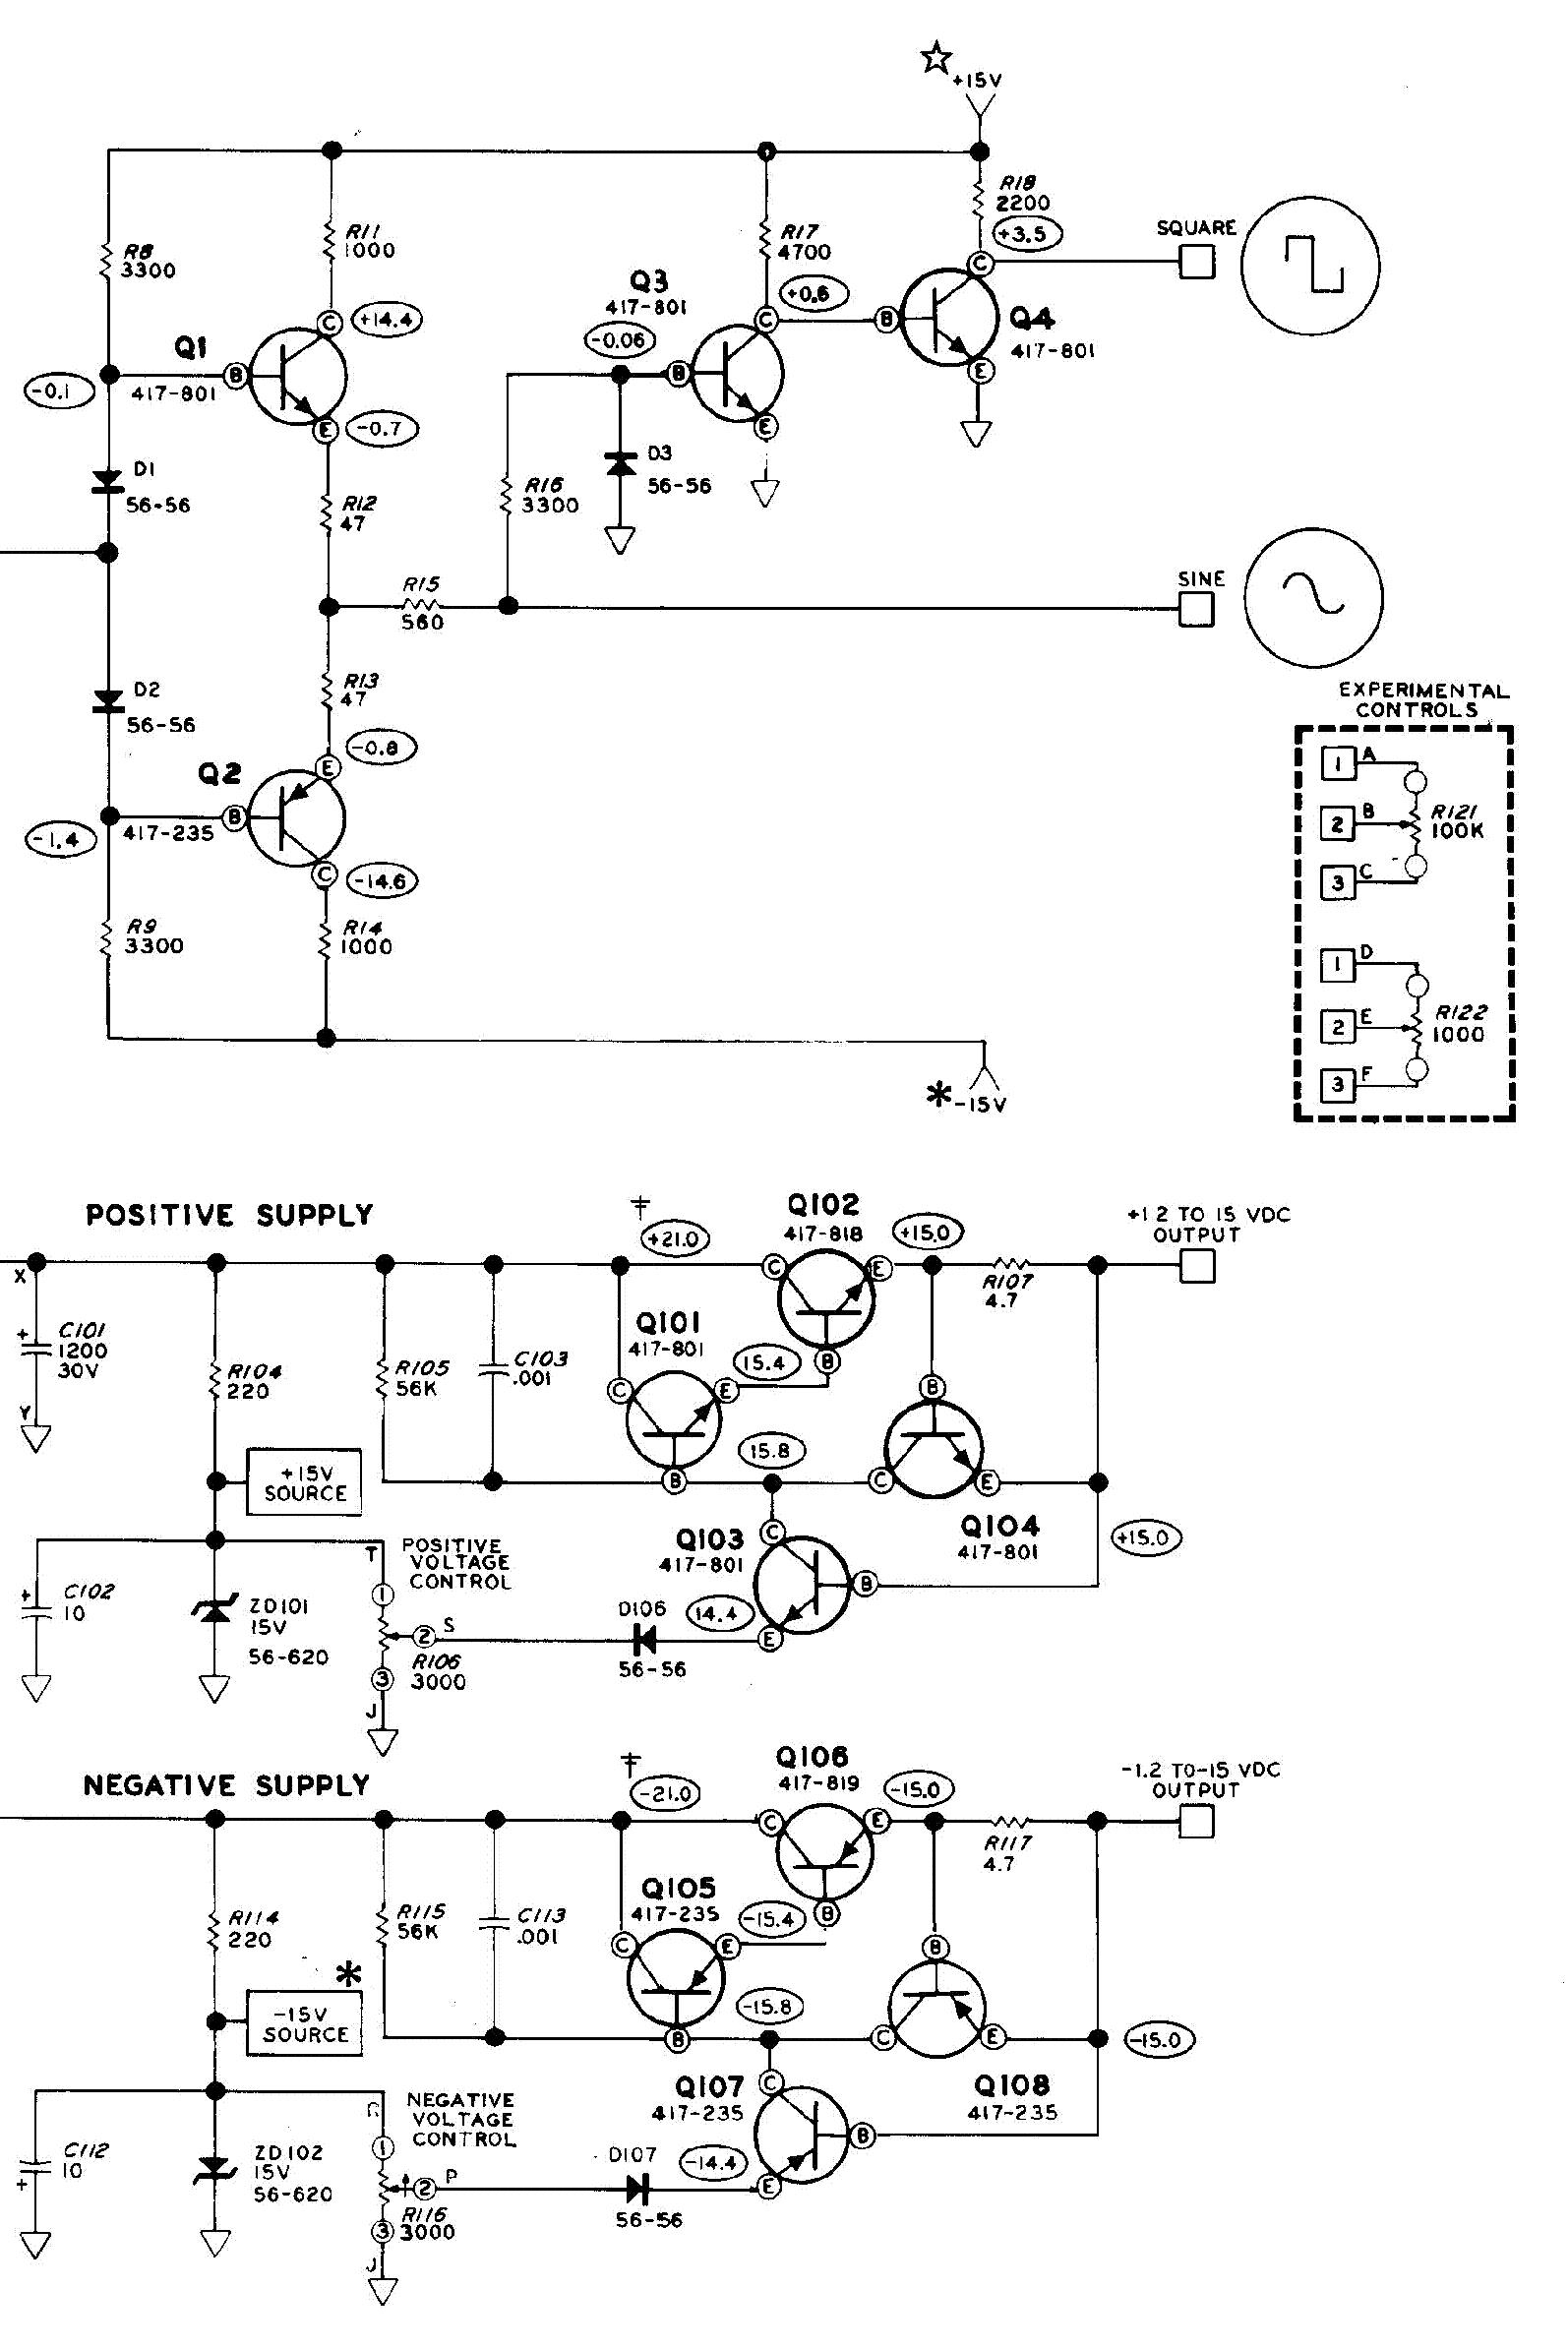 HEATHKIT ET-3100 ELECTRONIC DESIGN-EXPERIMENTER SIGNAL